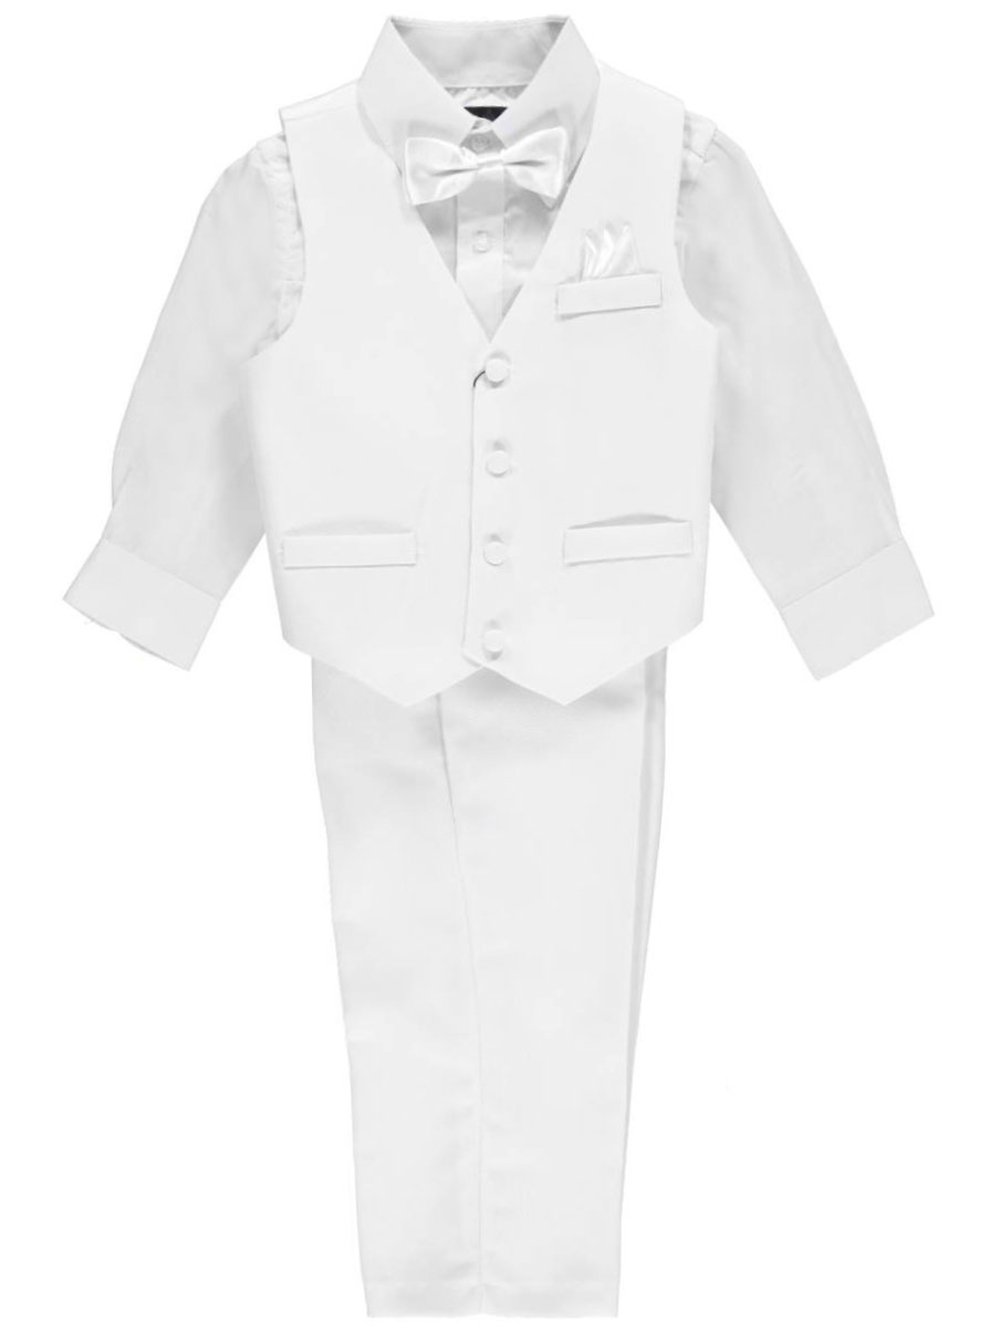 Vittorino Little Boys' Toddler 4-Piece Vest Set 2t